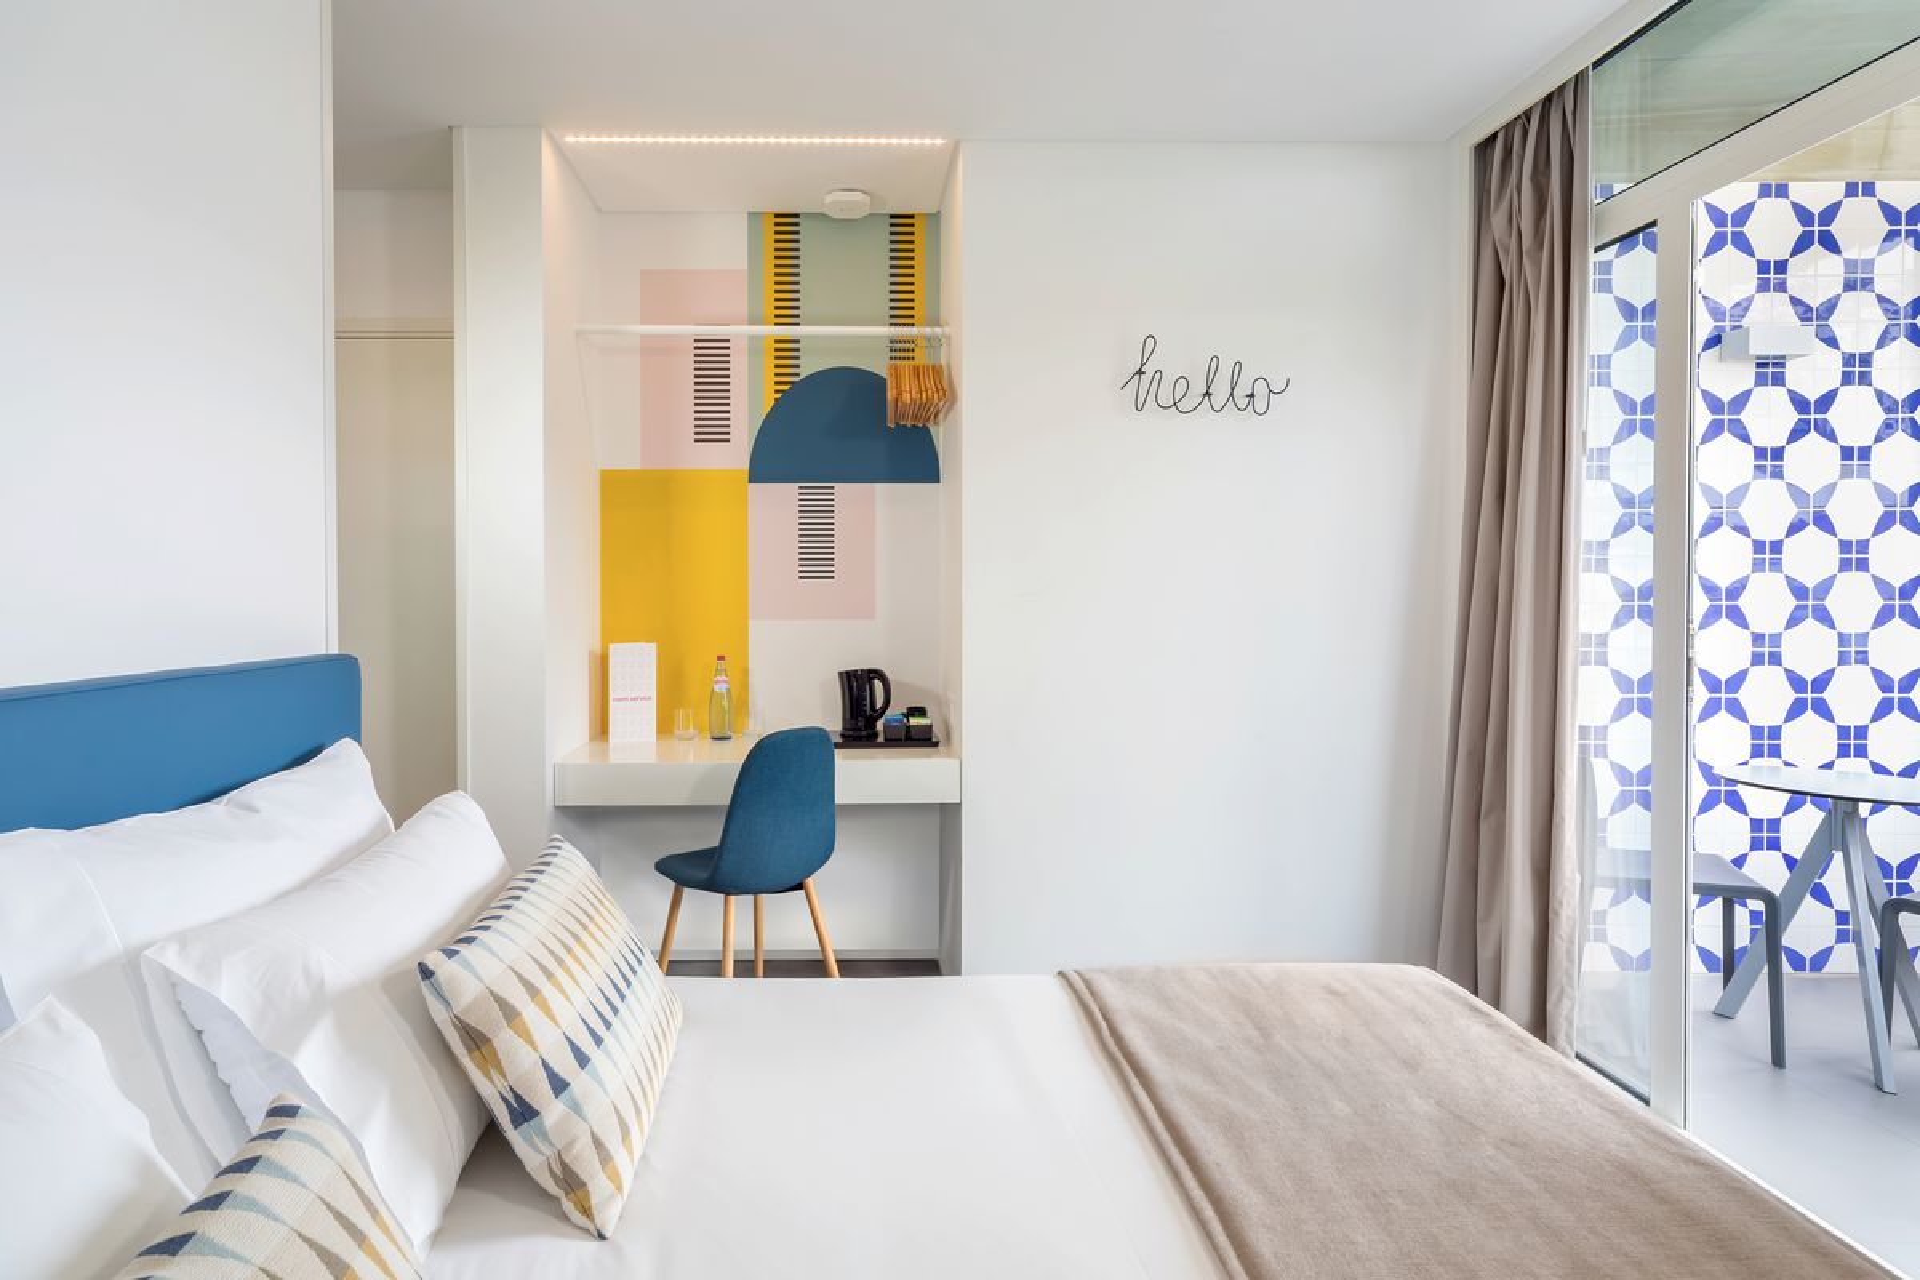 Madère - Ile de Madère - Hôtel Allegro Madeira 4*